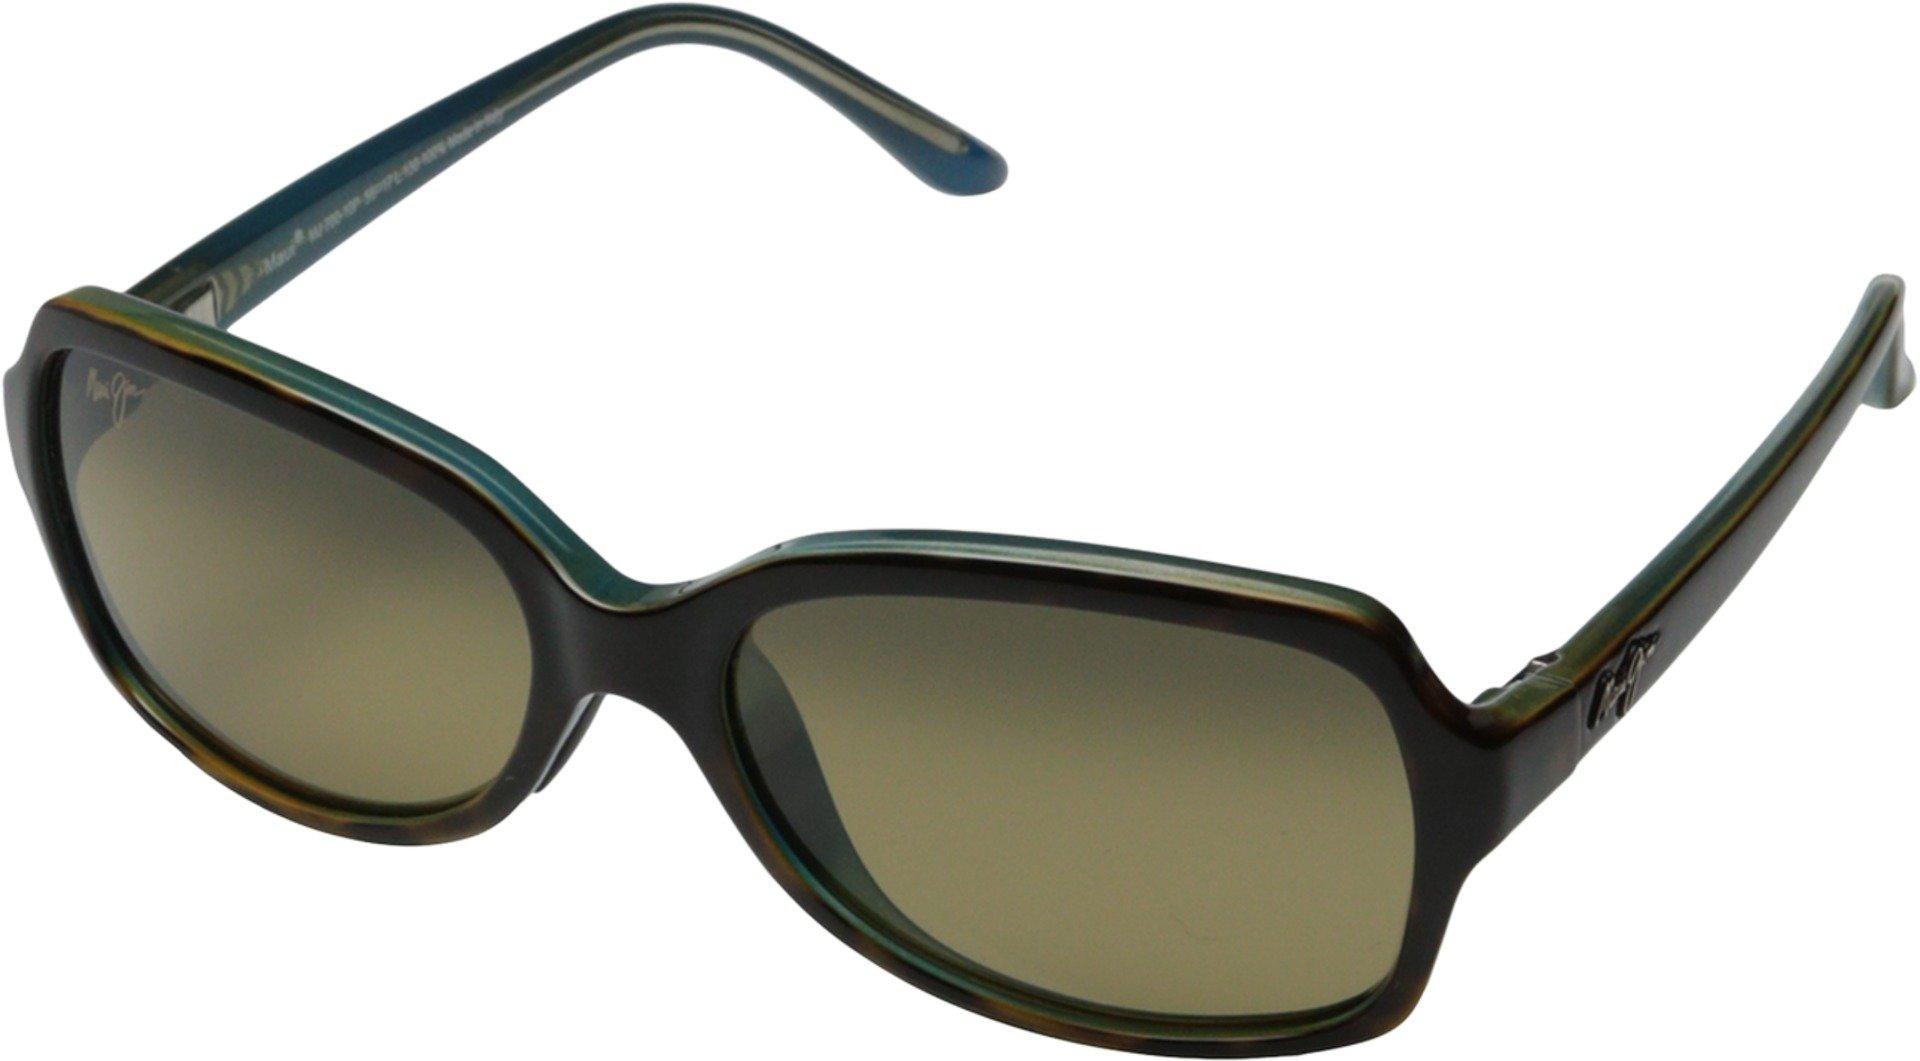 Maui Jim Cloud Break Polarized Sunglasses - Women's Tortoise with Peacock Blue / HCL Bronze One Size